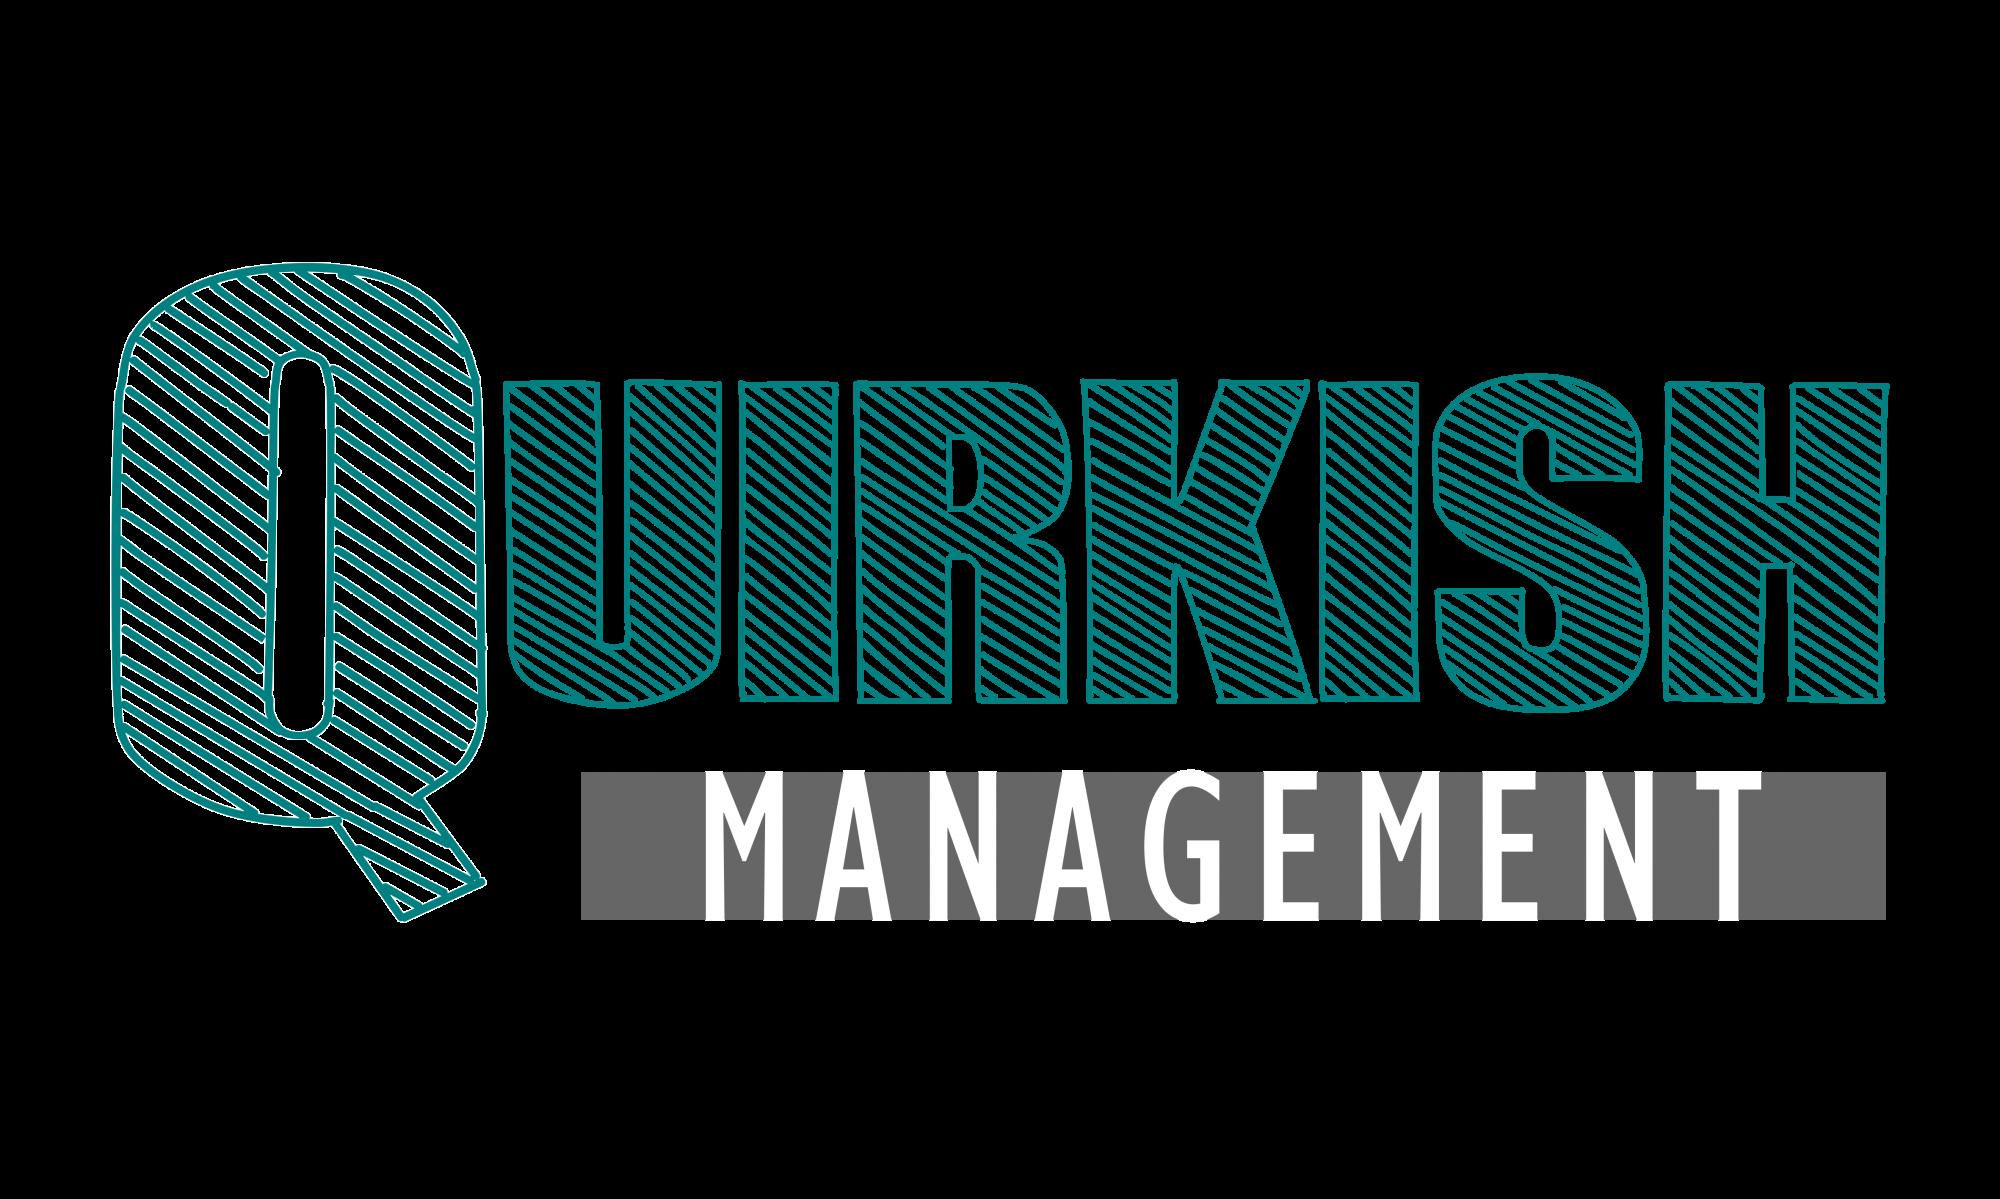 Quirkish management